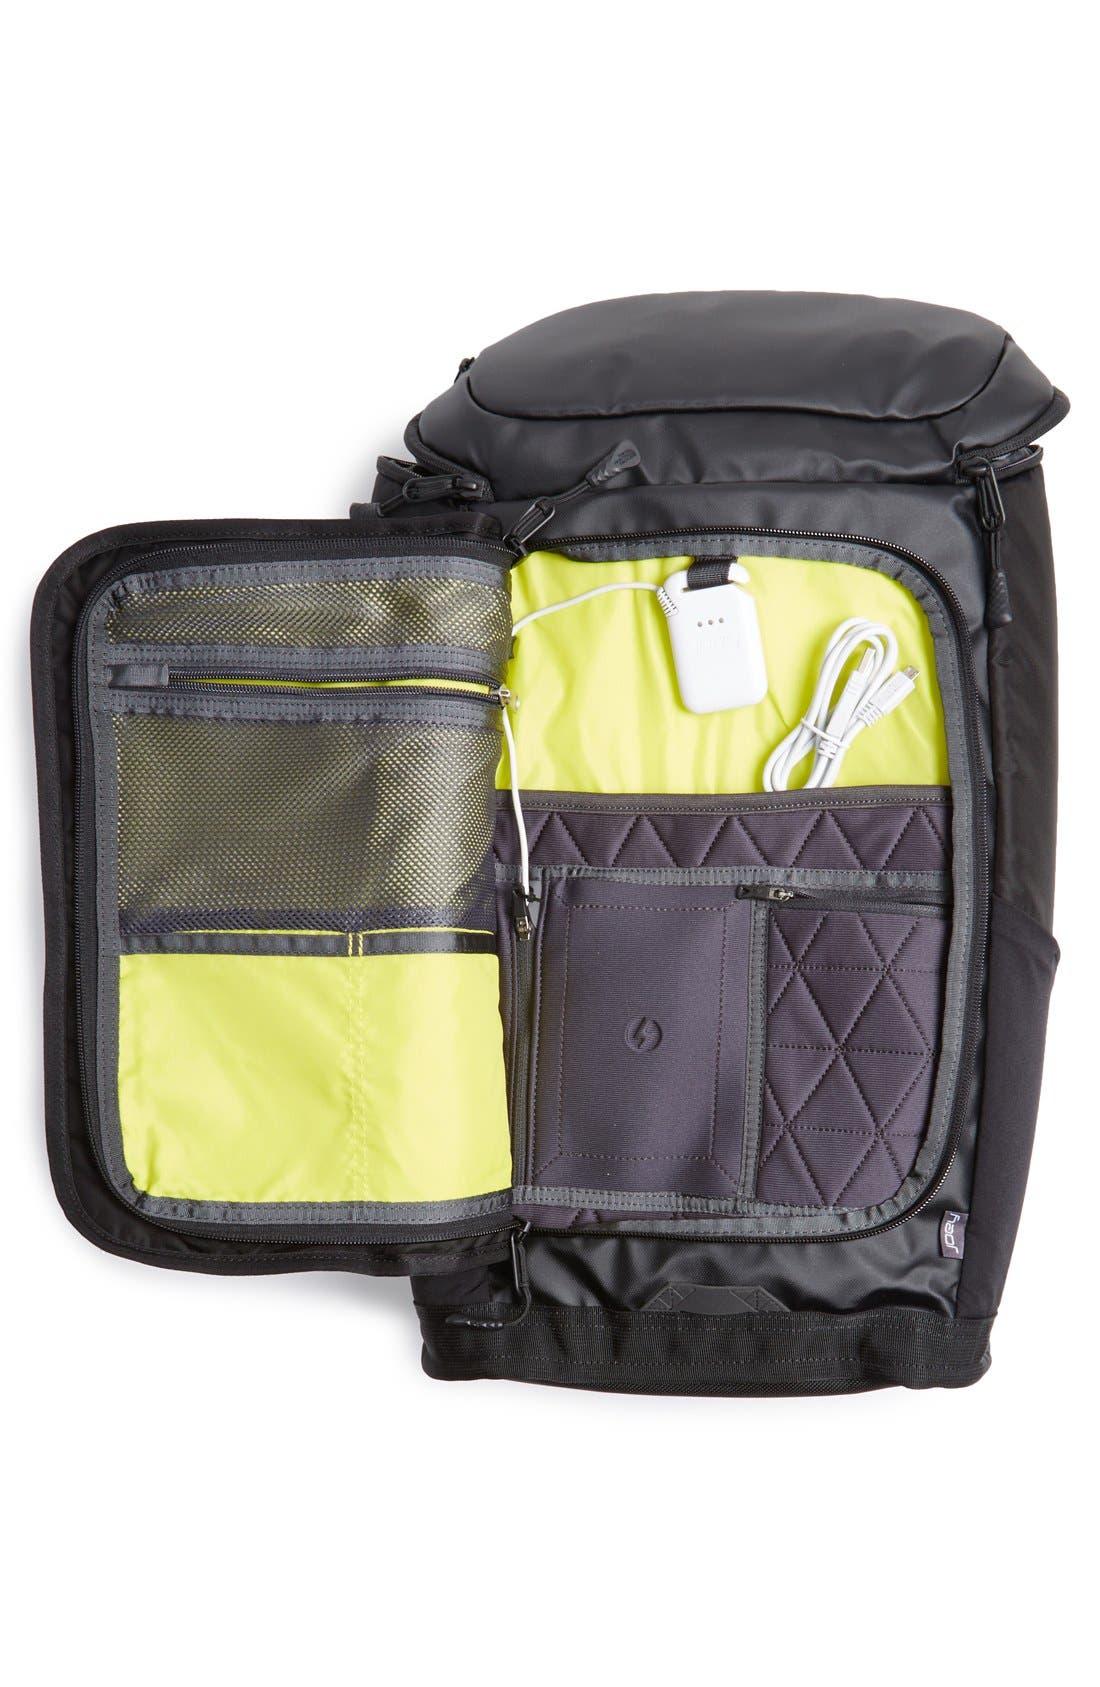 _11108845?crop=pad&pad_color=FFF&format=jpeg&trim=color&trimcolor=FFF&w=860&h=924 the north face 'fuse box charged' backpack nordstrom north face fuse box backpack at gsmx.co